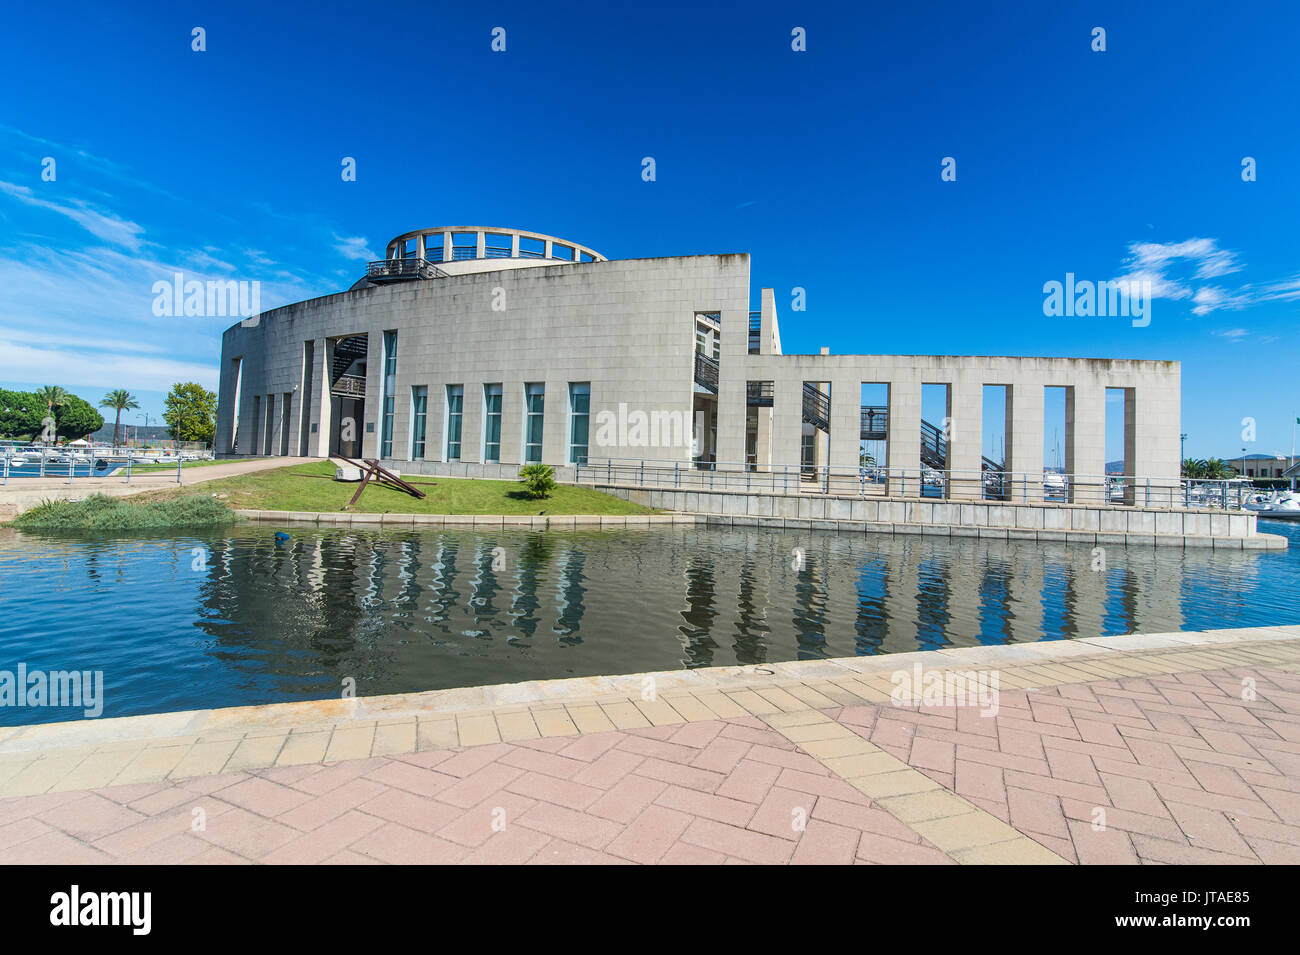 Museo Arqueológico Nacional moderna de Olbia, Cerdeña, Italia, Mediterráneo, Europa Imagen De Stock